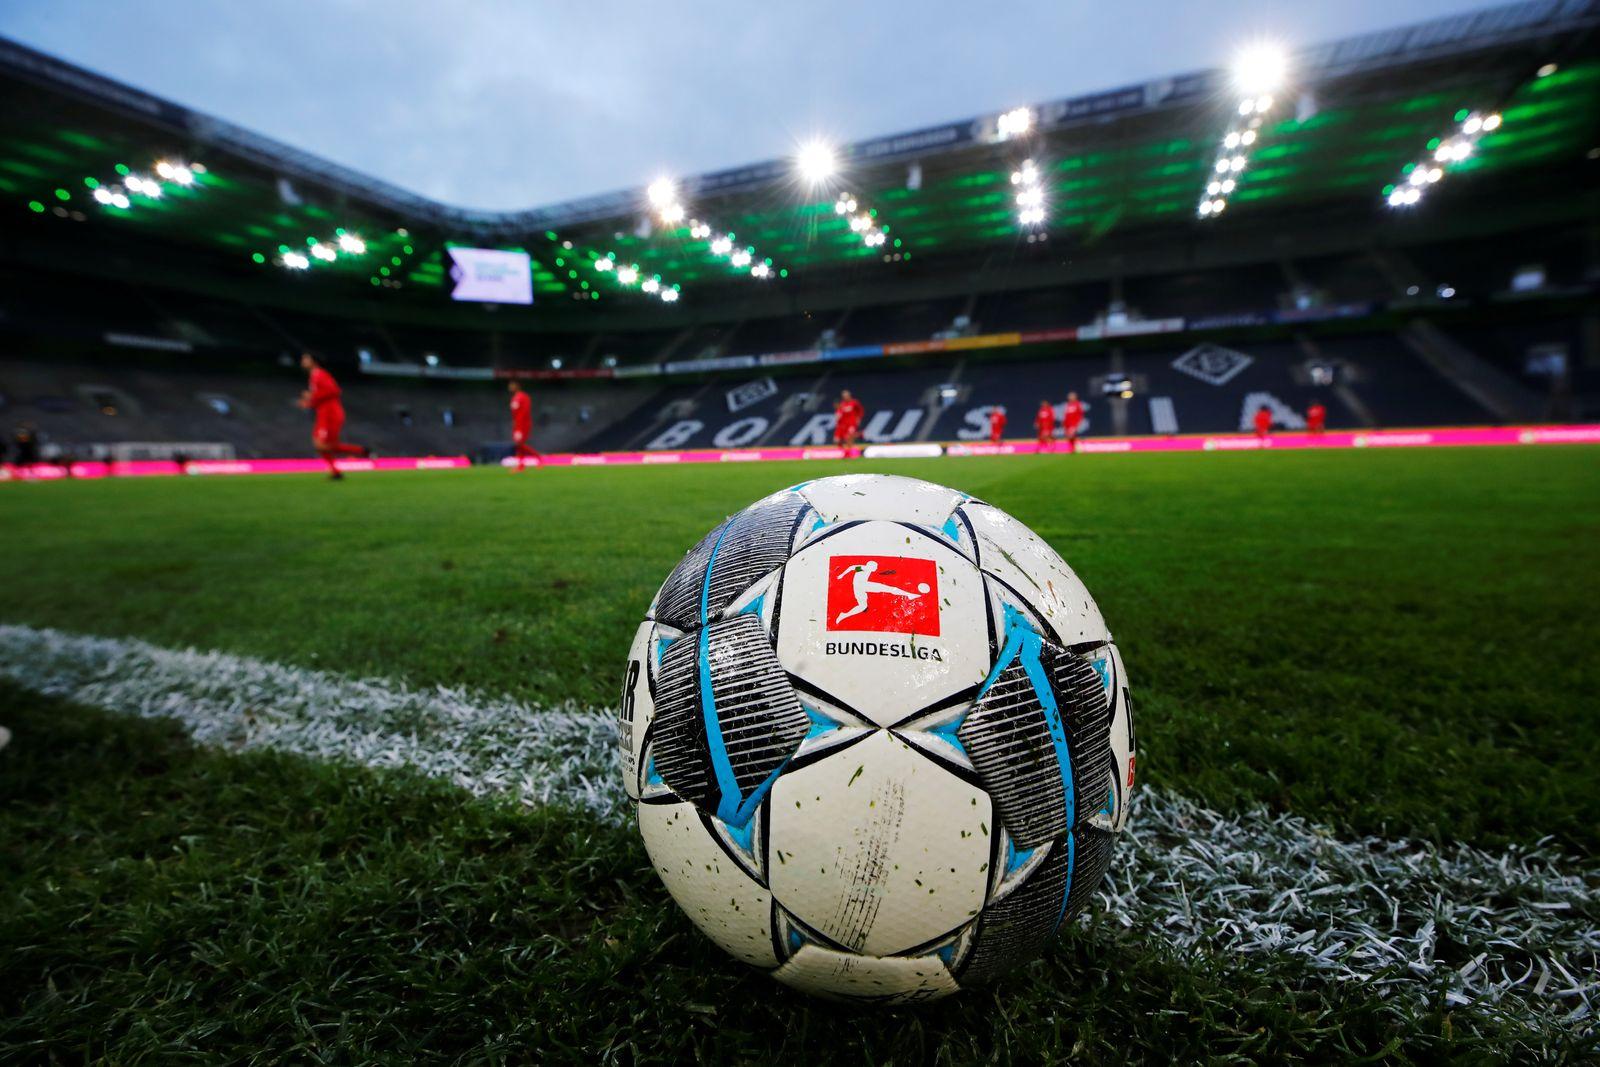 Bundesliga - Borussia Moenchengladbach v FC Cologne